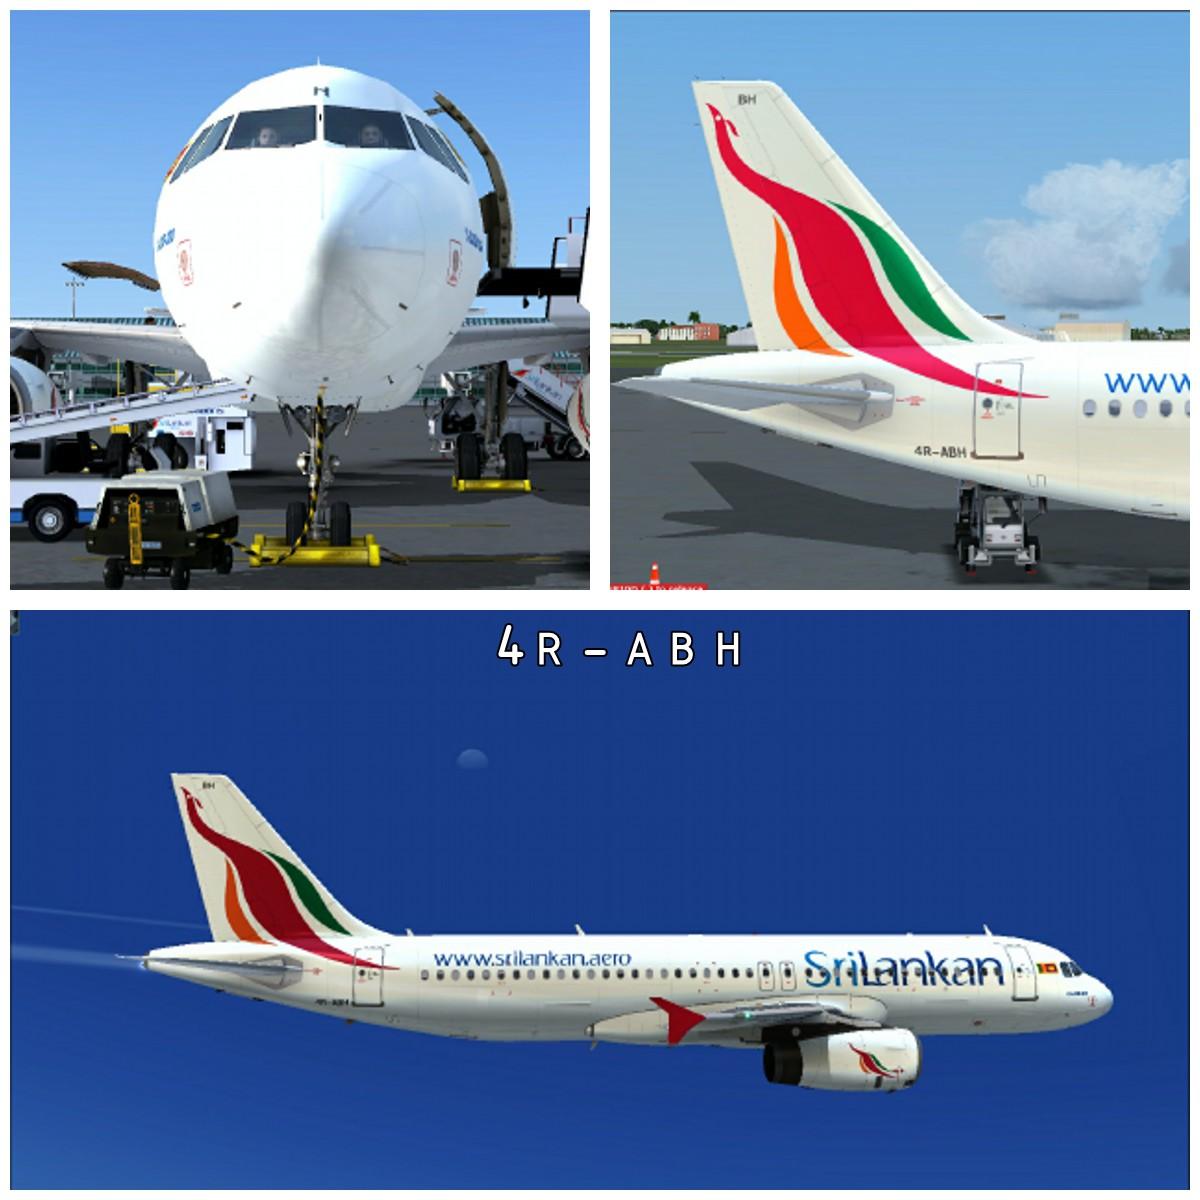 We Love airplanes Srilanka: Airline Repaints